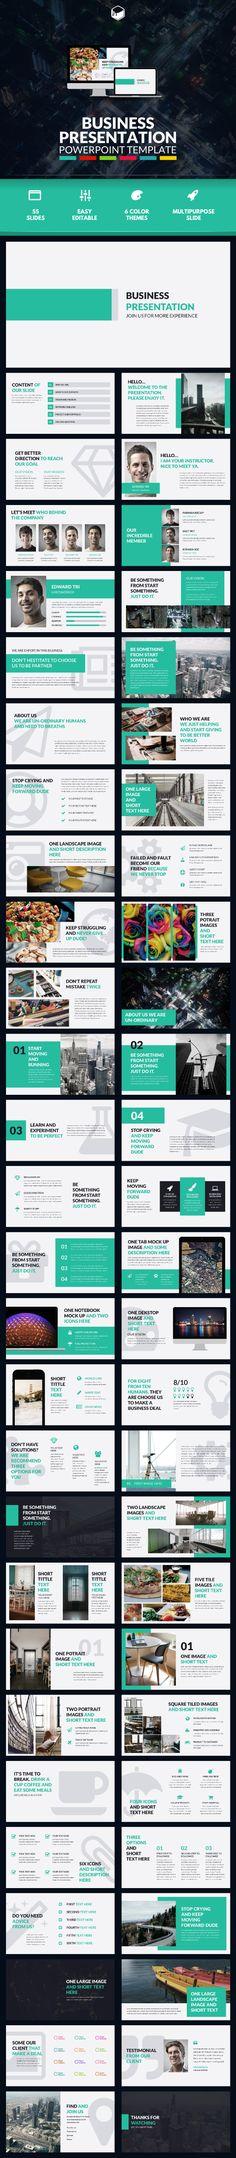 Business Presentation 3 - PowerPoint Template